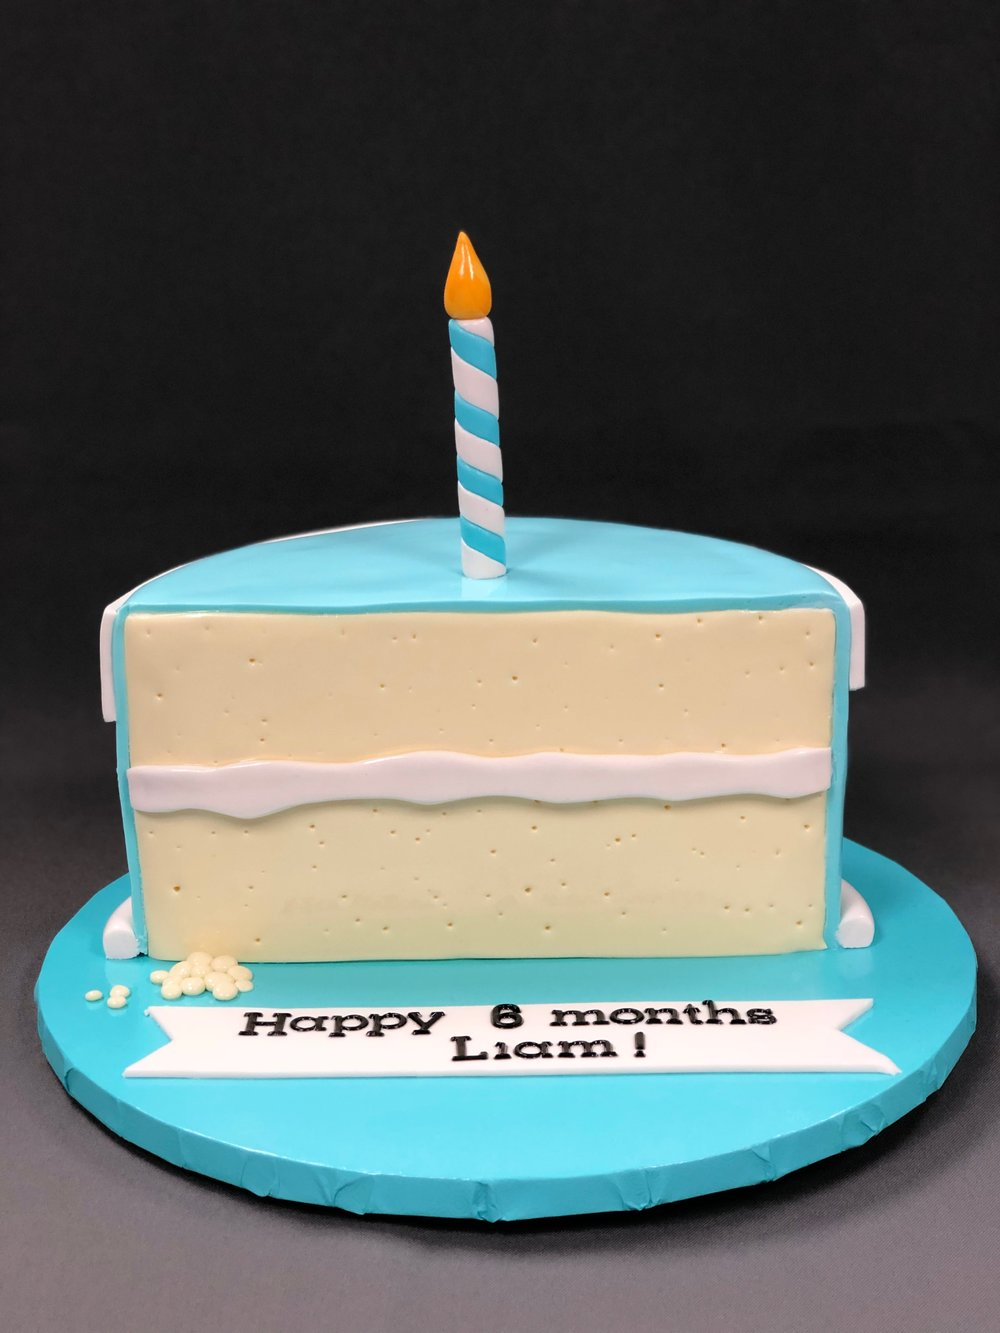 6 Months Birthday Cake New Jersey